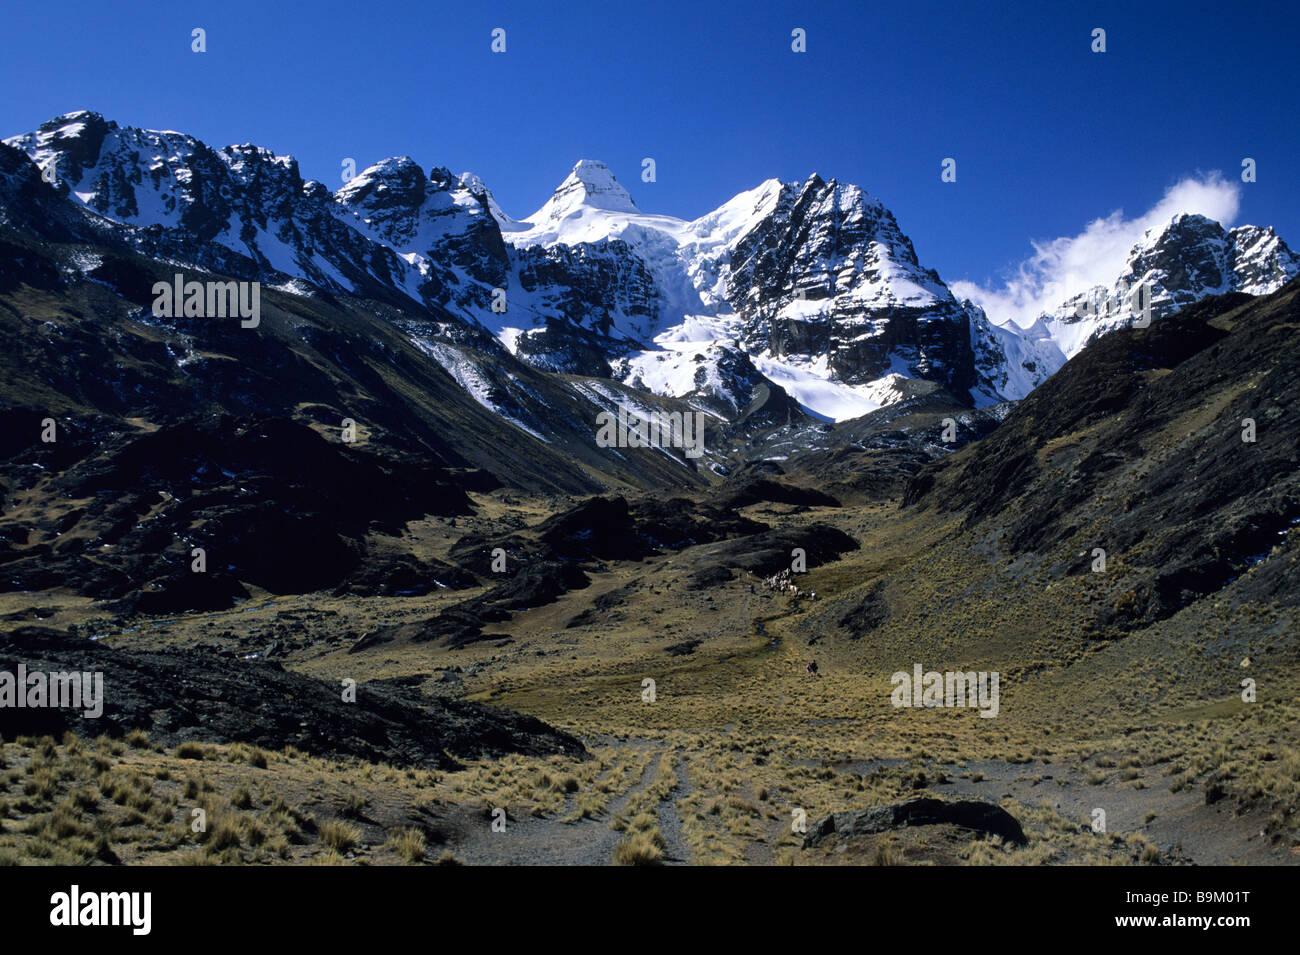 Bolivia, La Paz department, Real Cordillera, Condoriri mountains, trekking - Stock Image